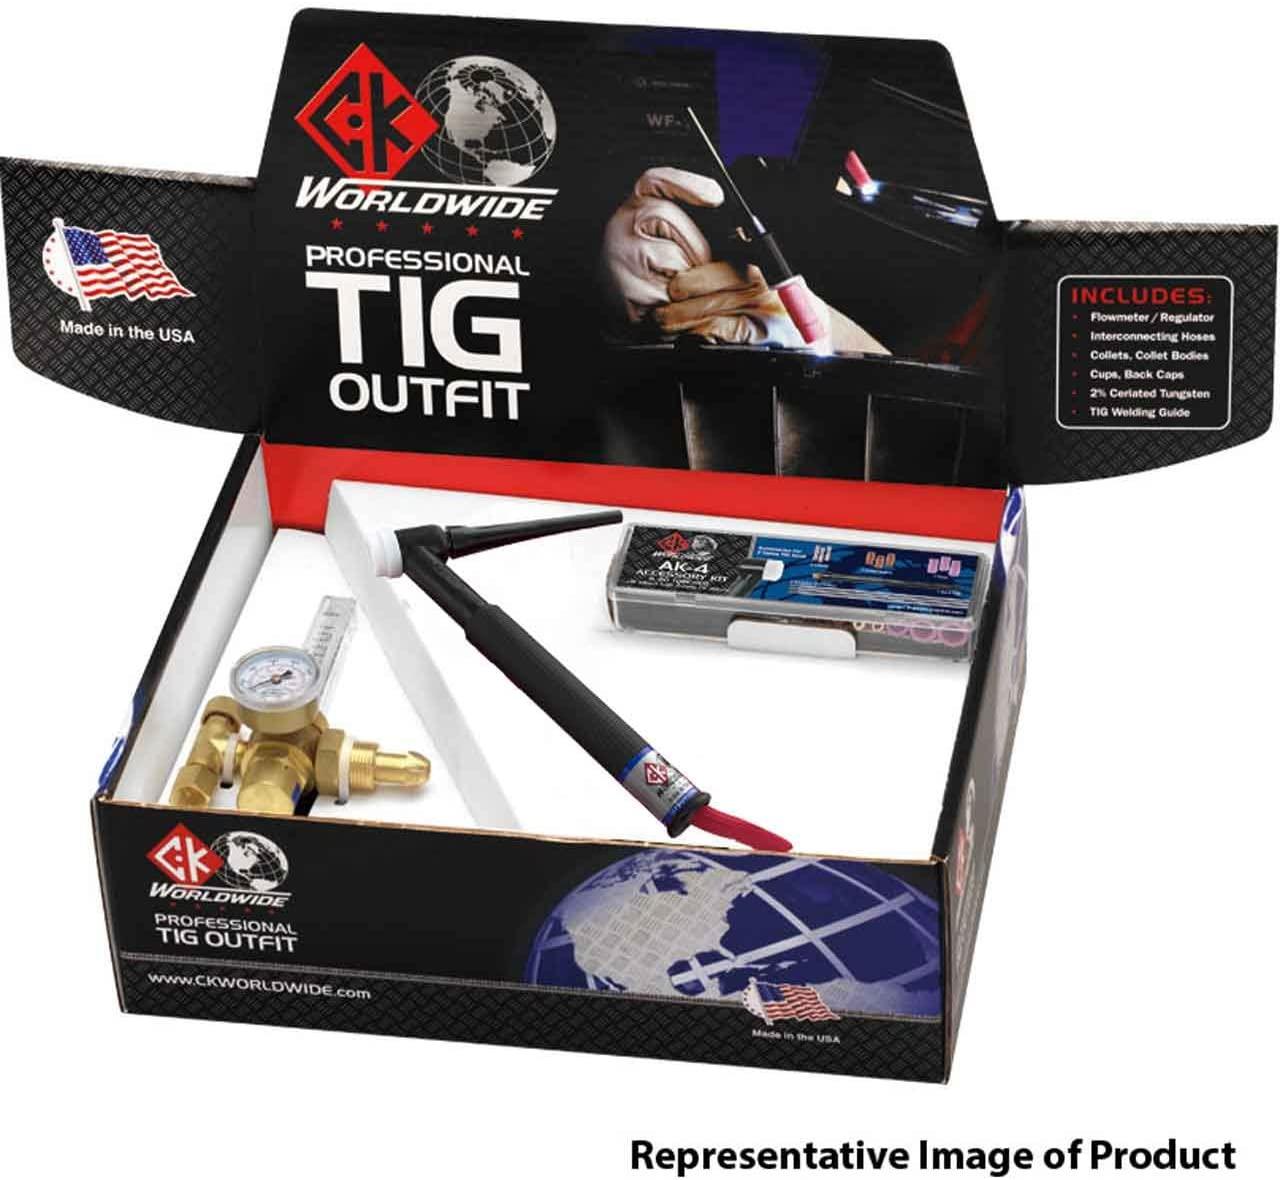 CK Professional TIG Outfit CK26 TIG Torch, 200A, Valve, 12.5', 2-Pc, PTO26V-12-2 RG